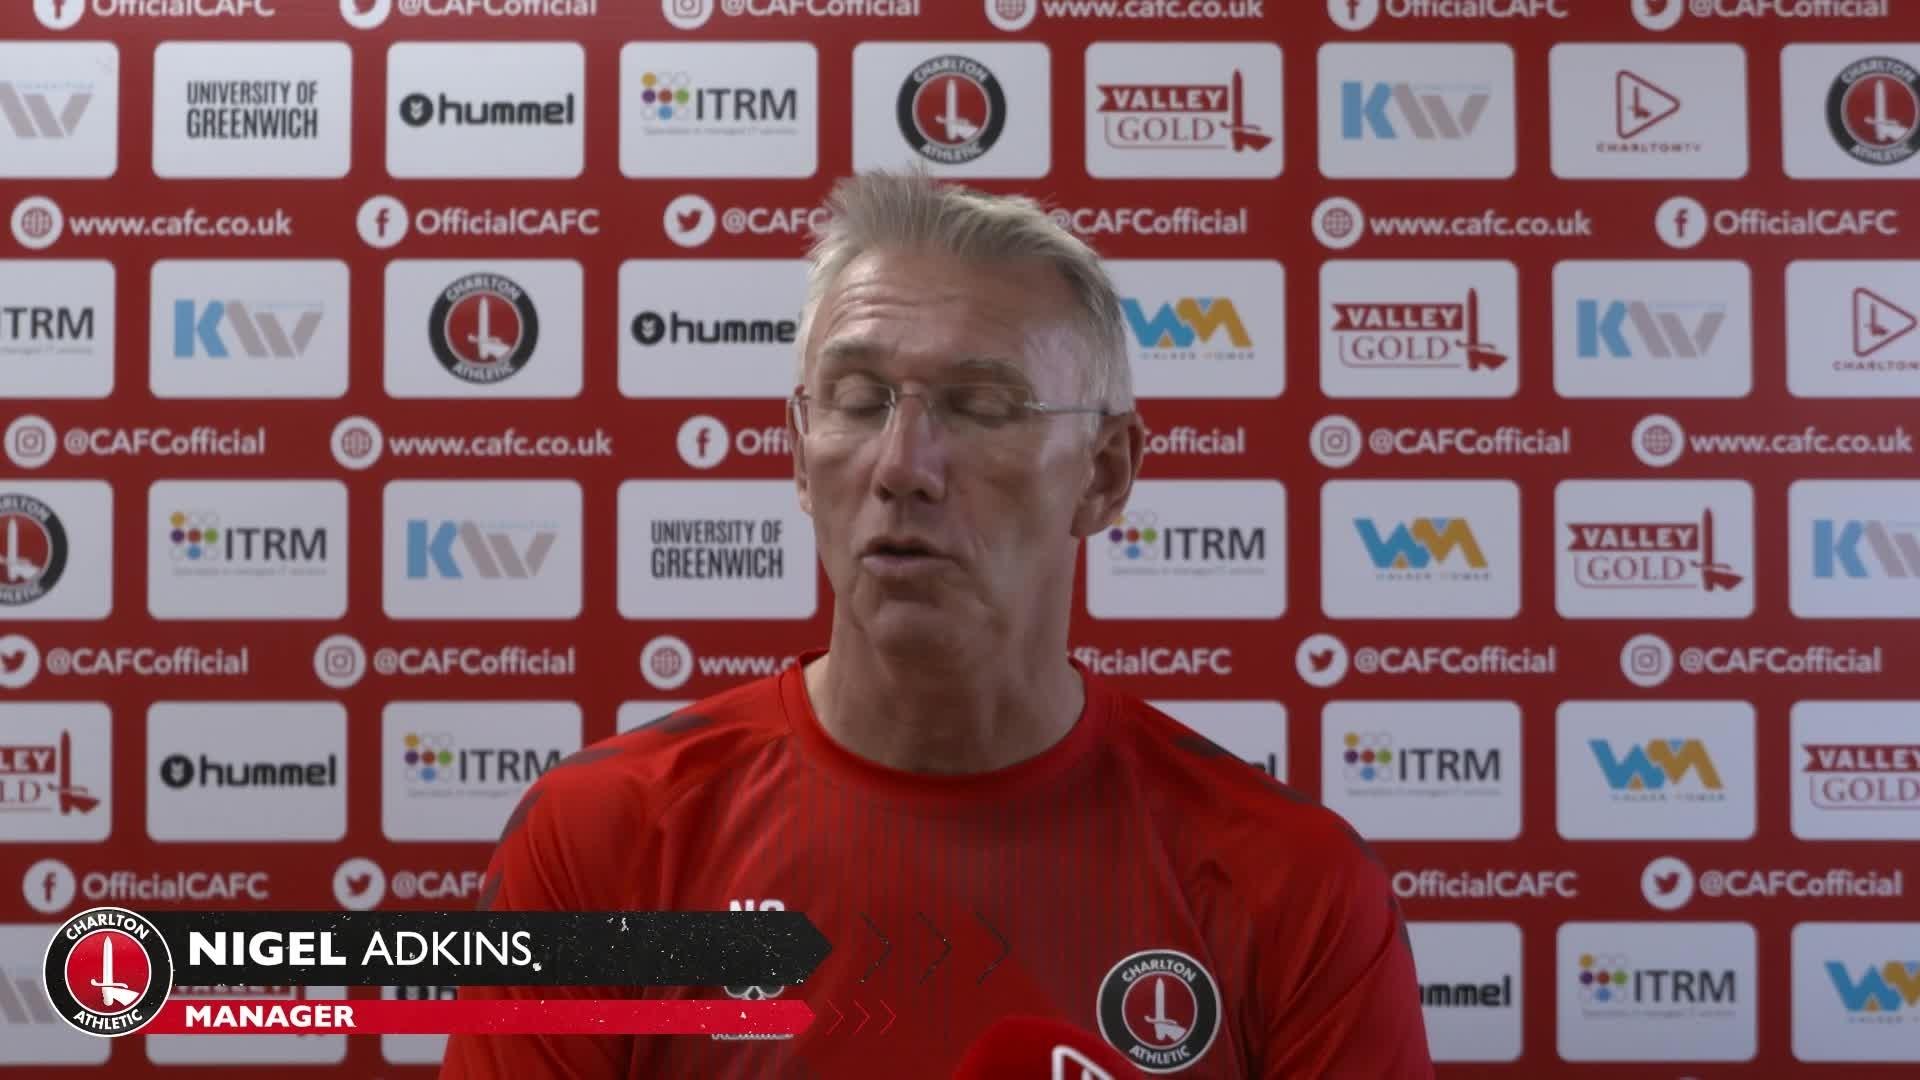 Nigel Adkins' pre-Wycombe press conference (September 2021)